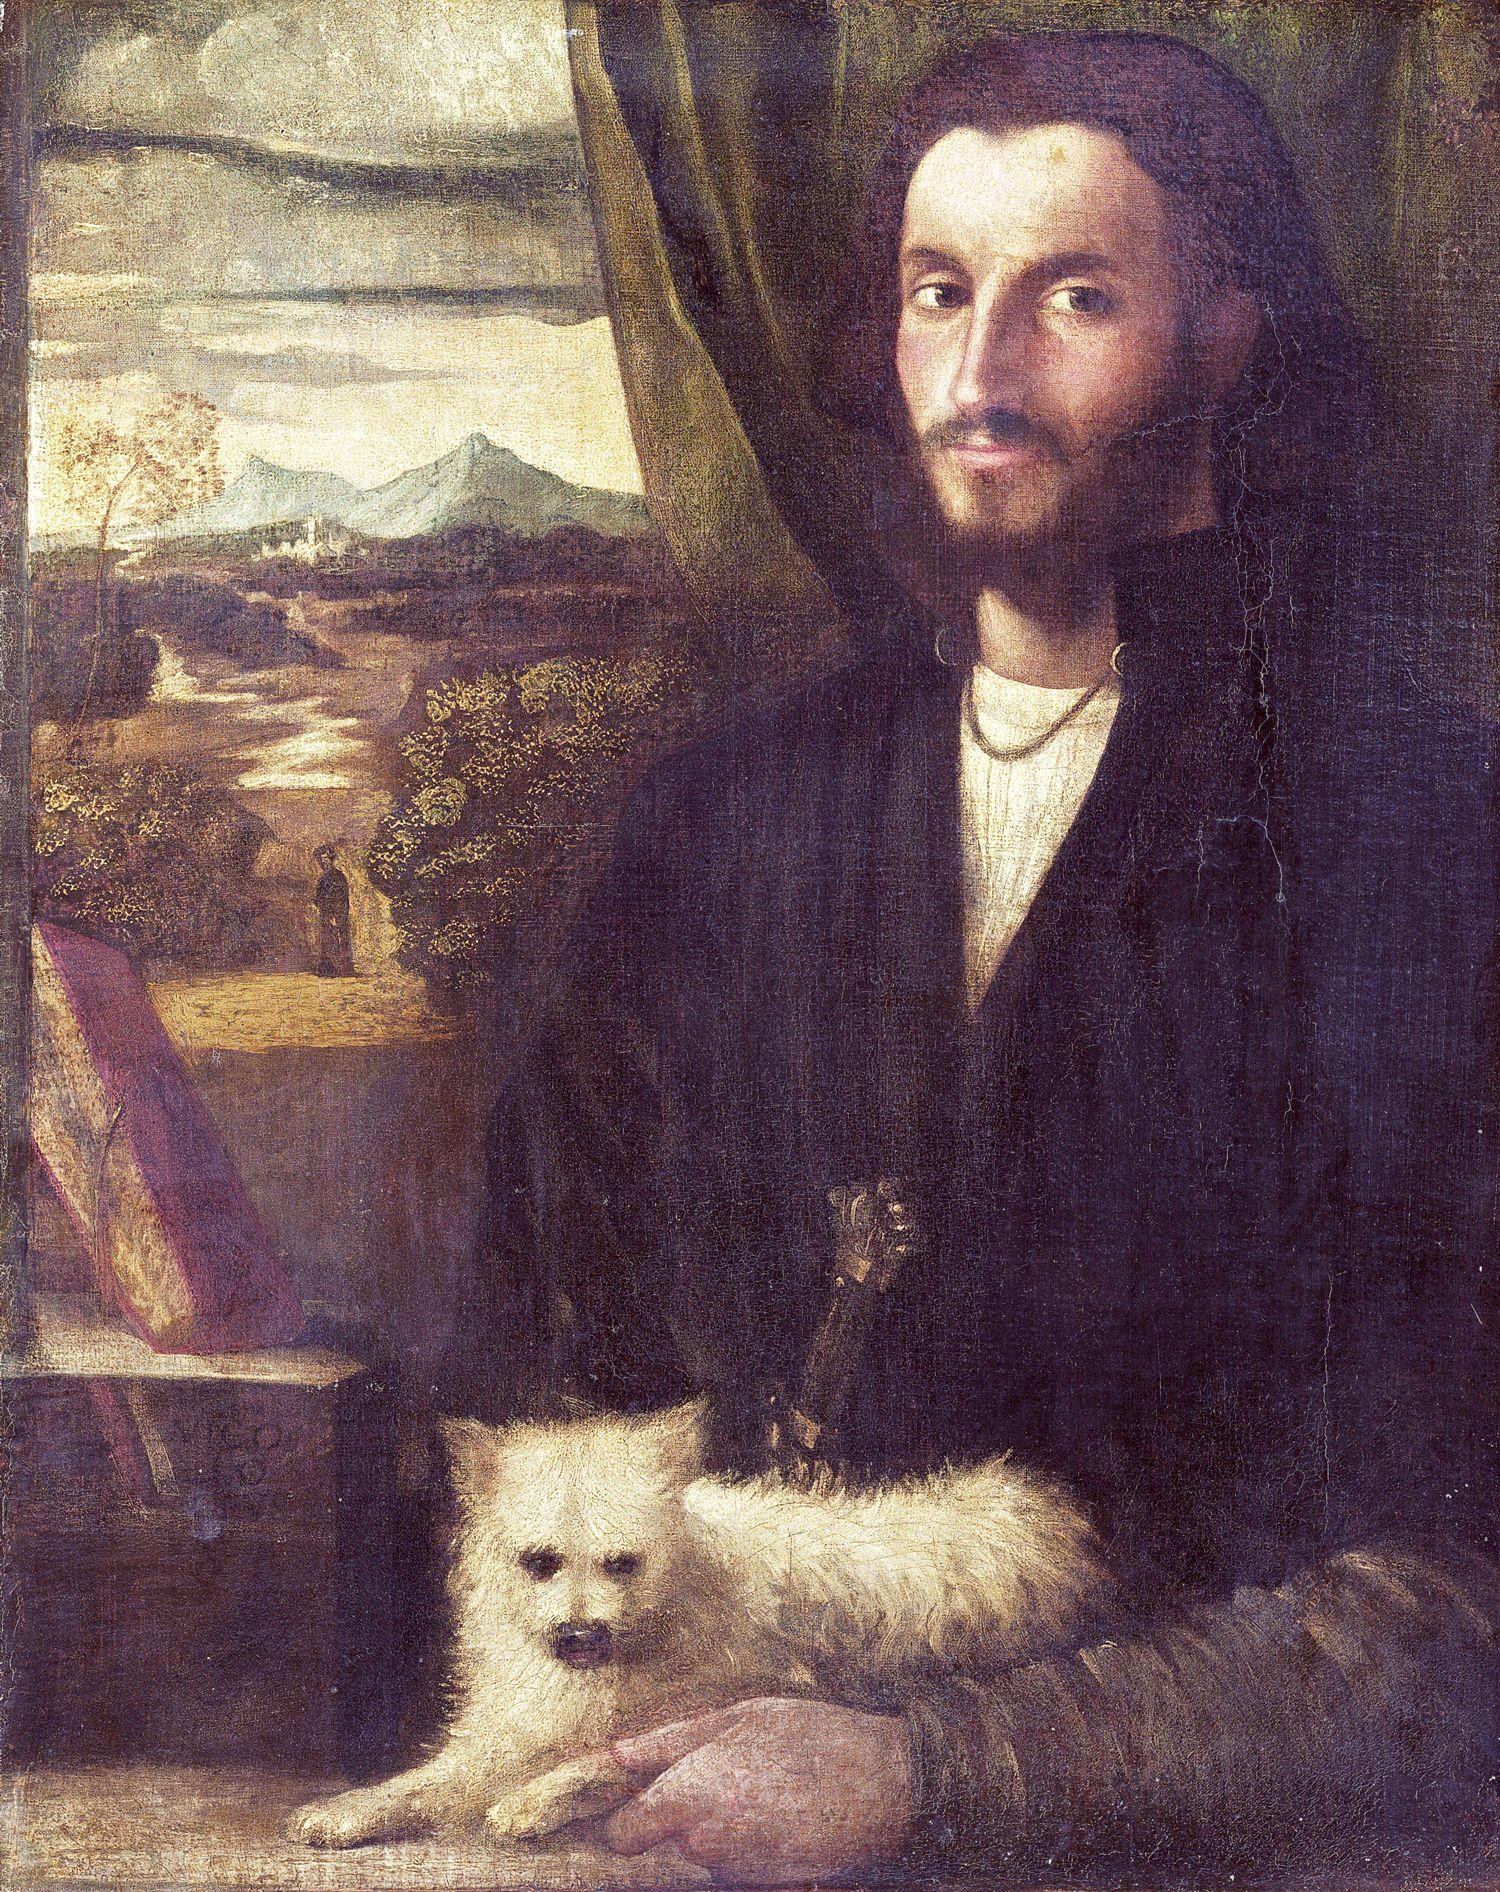 Резултат с изображение за leonardo da vinci